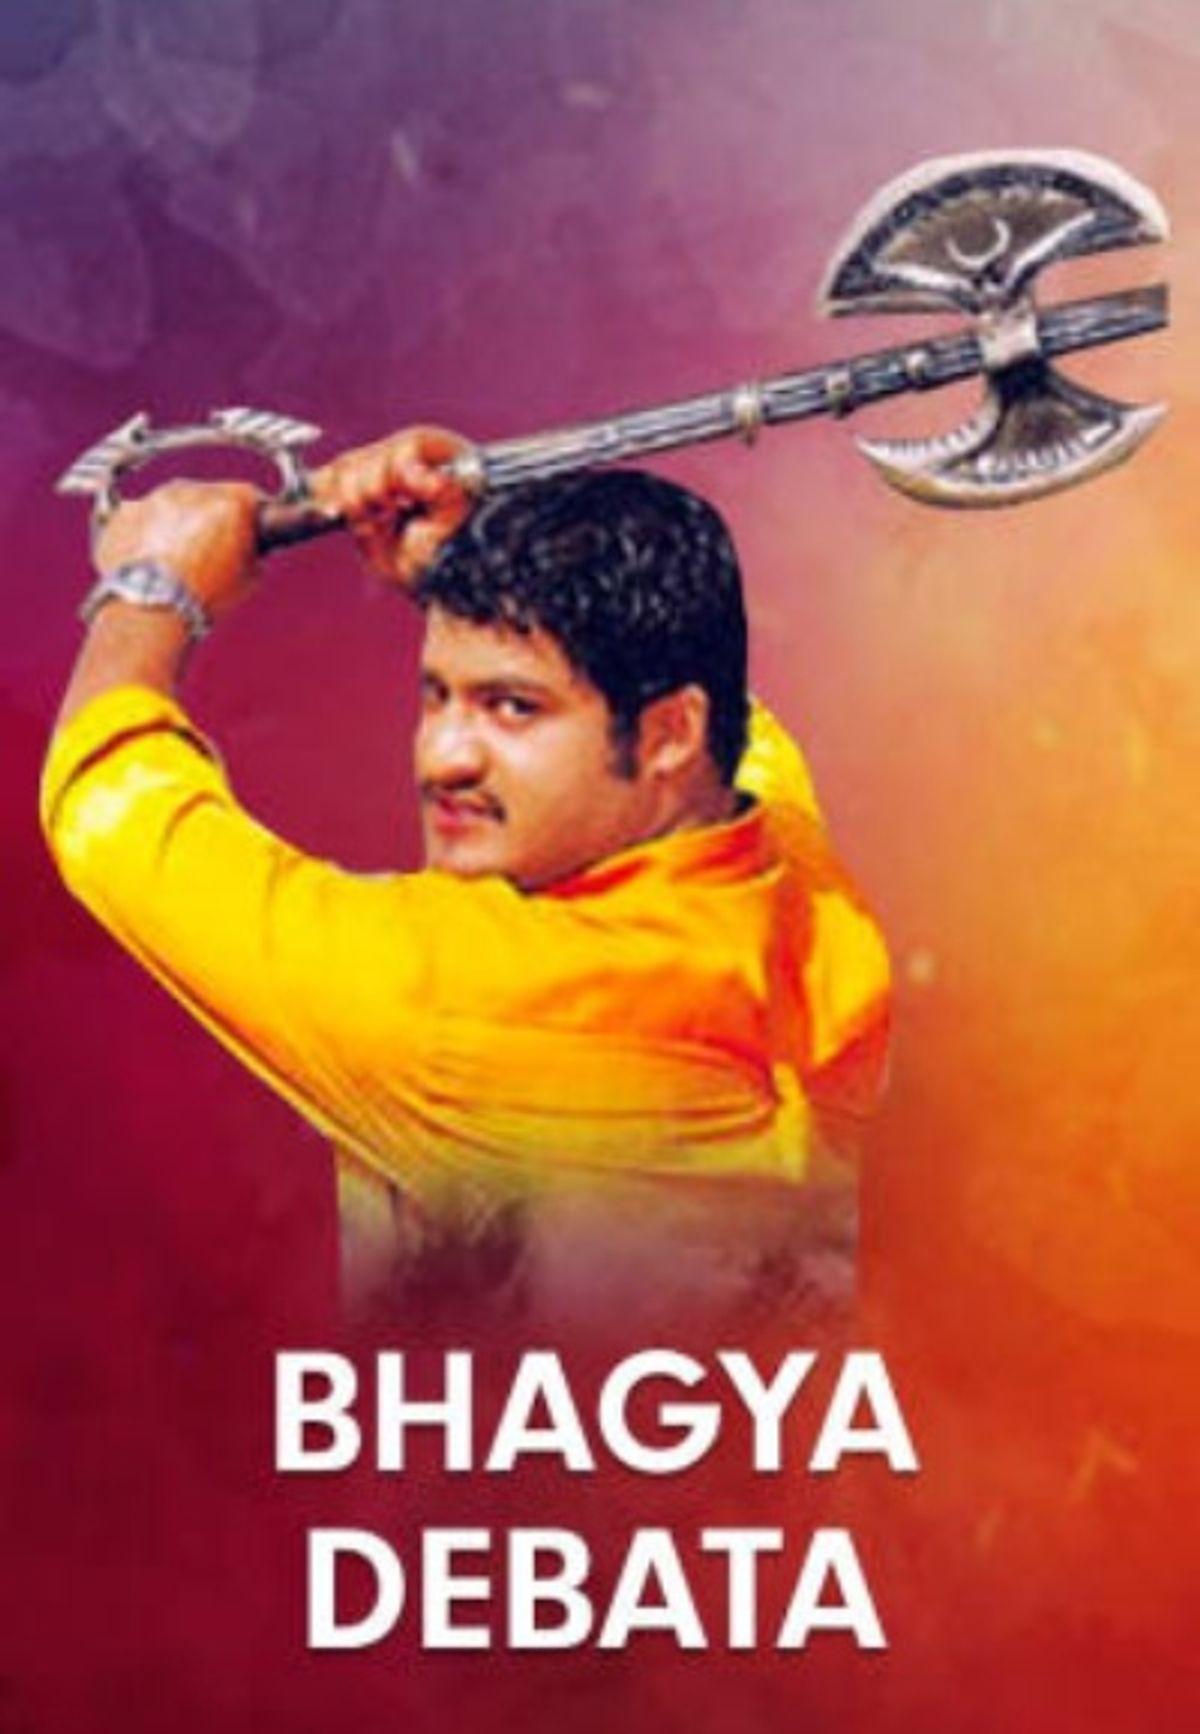 Bhagya Debata